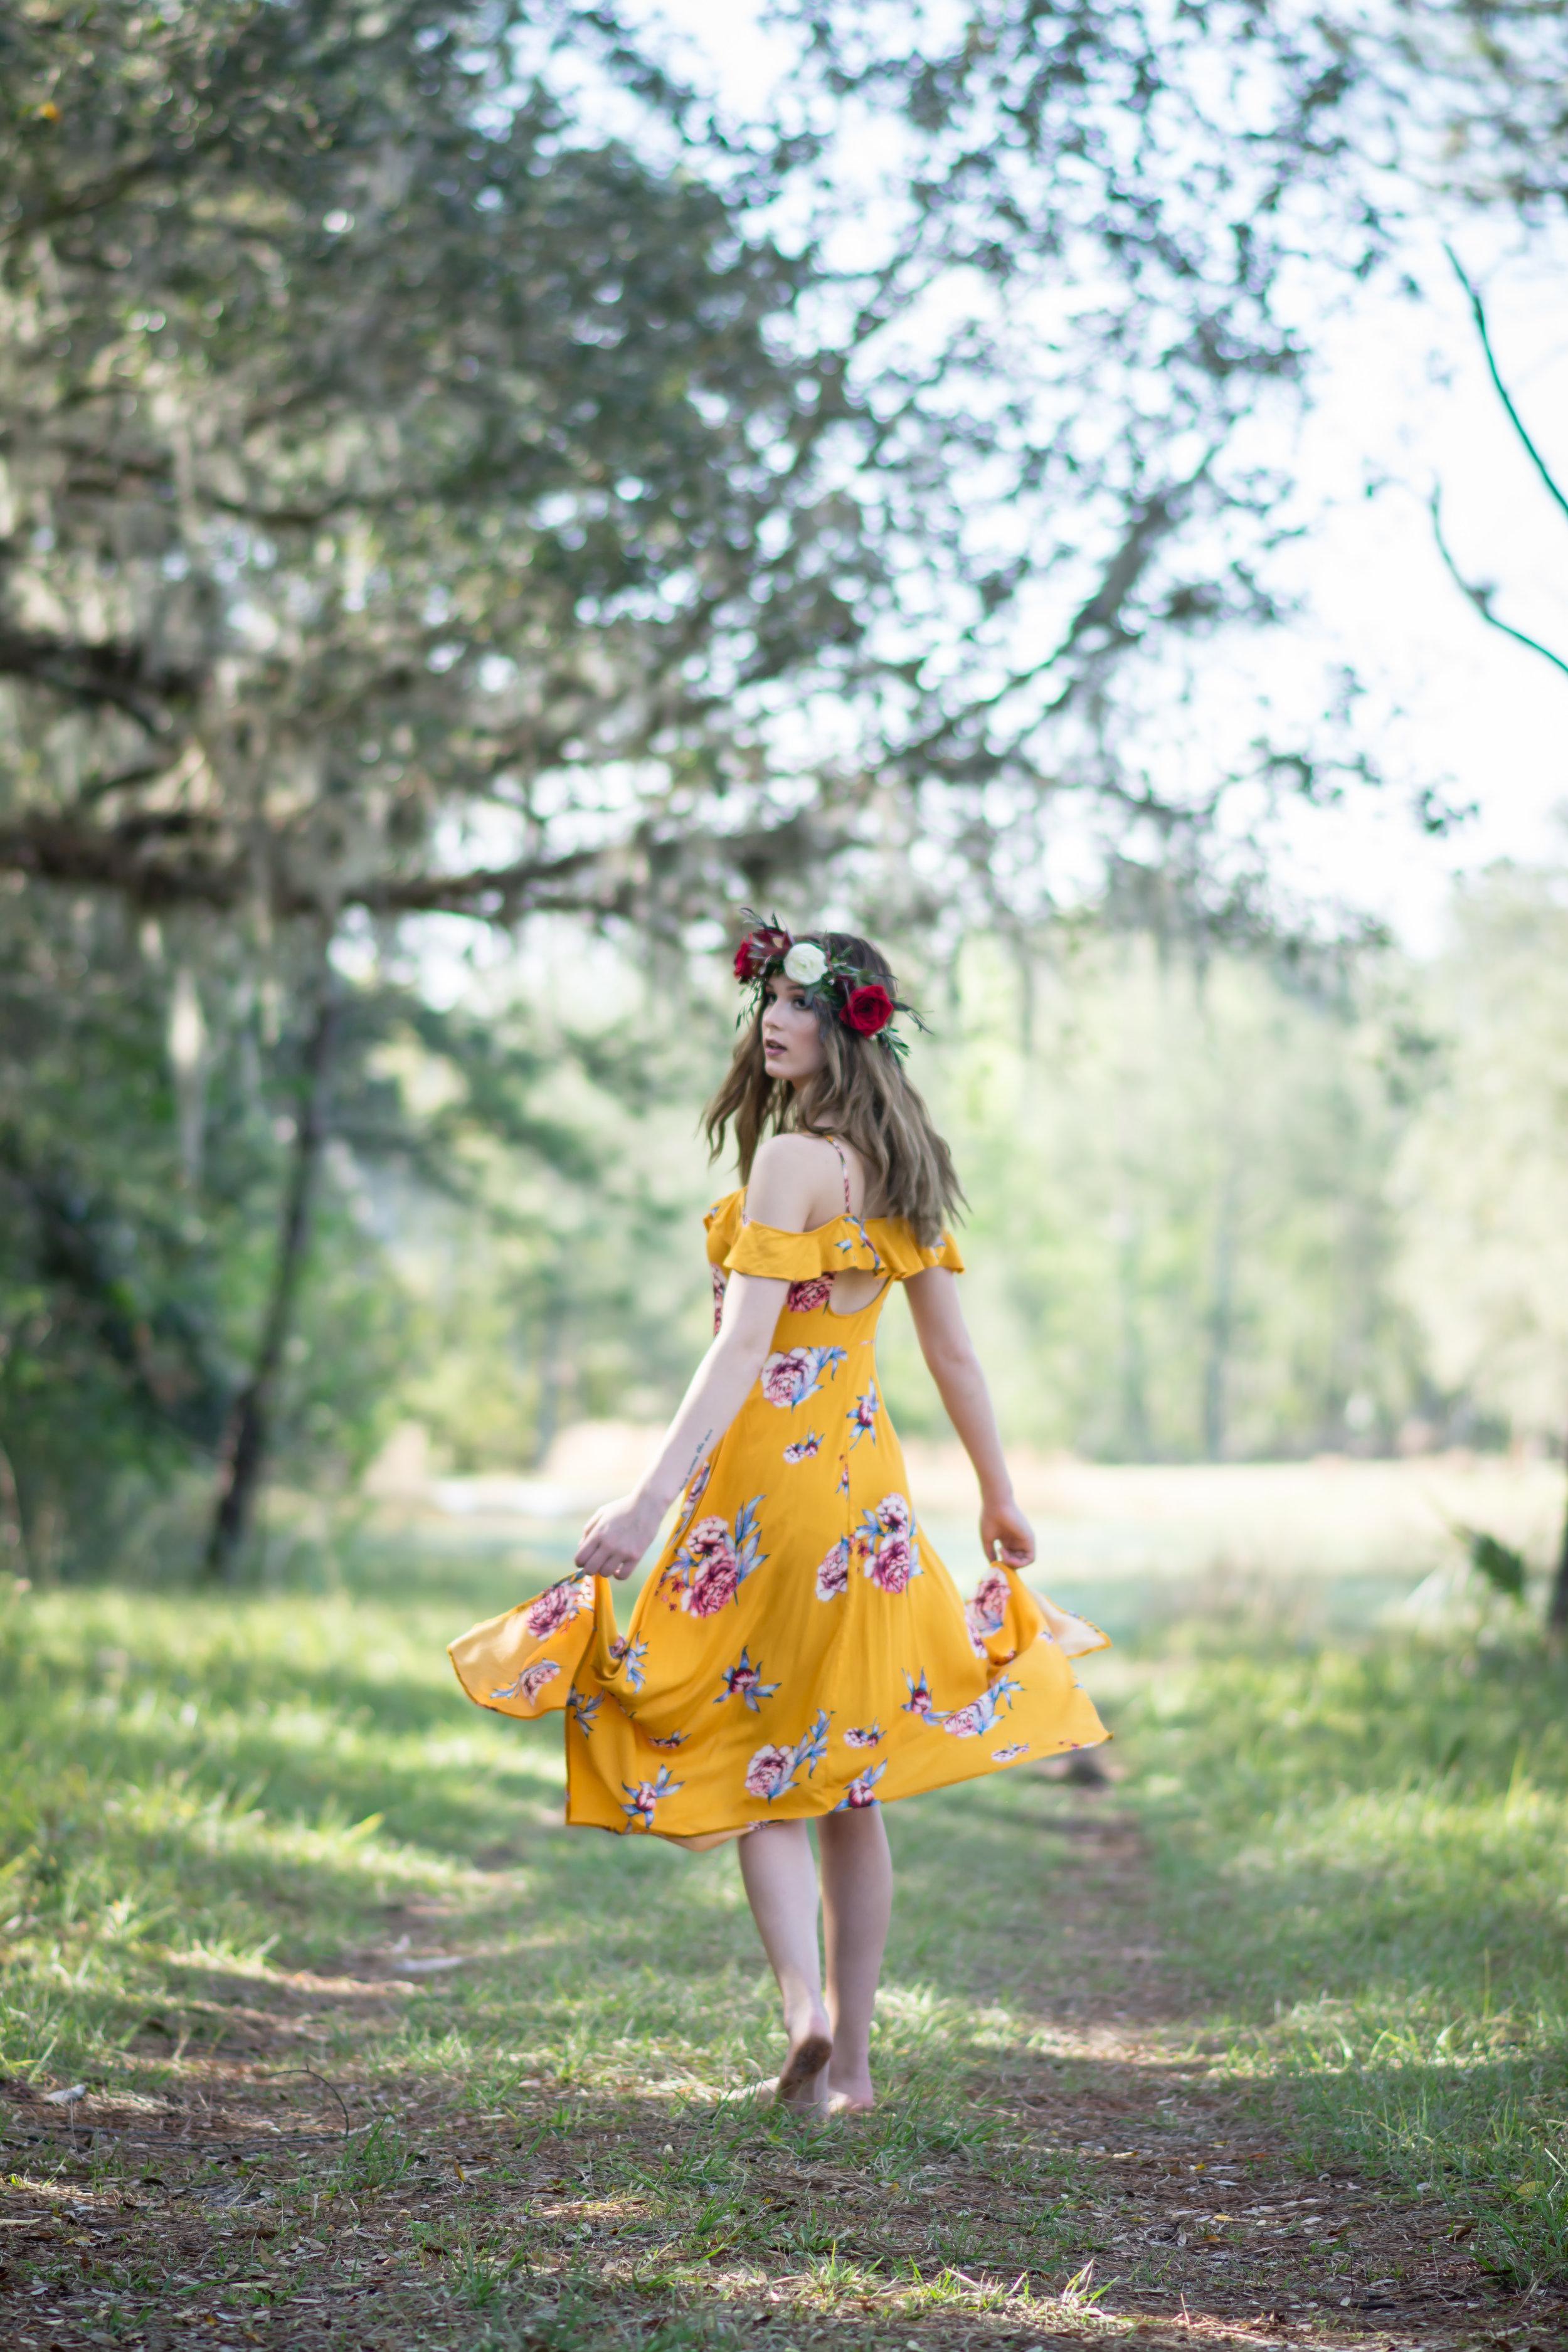 floral-headpiece-fashion-photoshoot-geneva-central-florida-photographer-yanitza-ninett-14.jpg